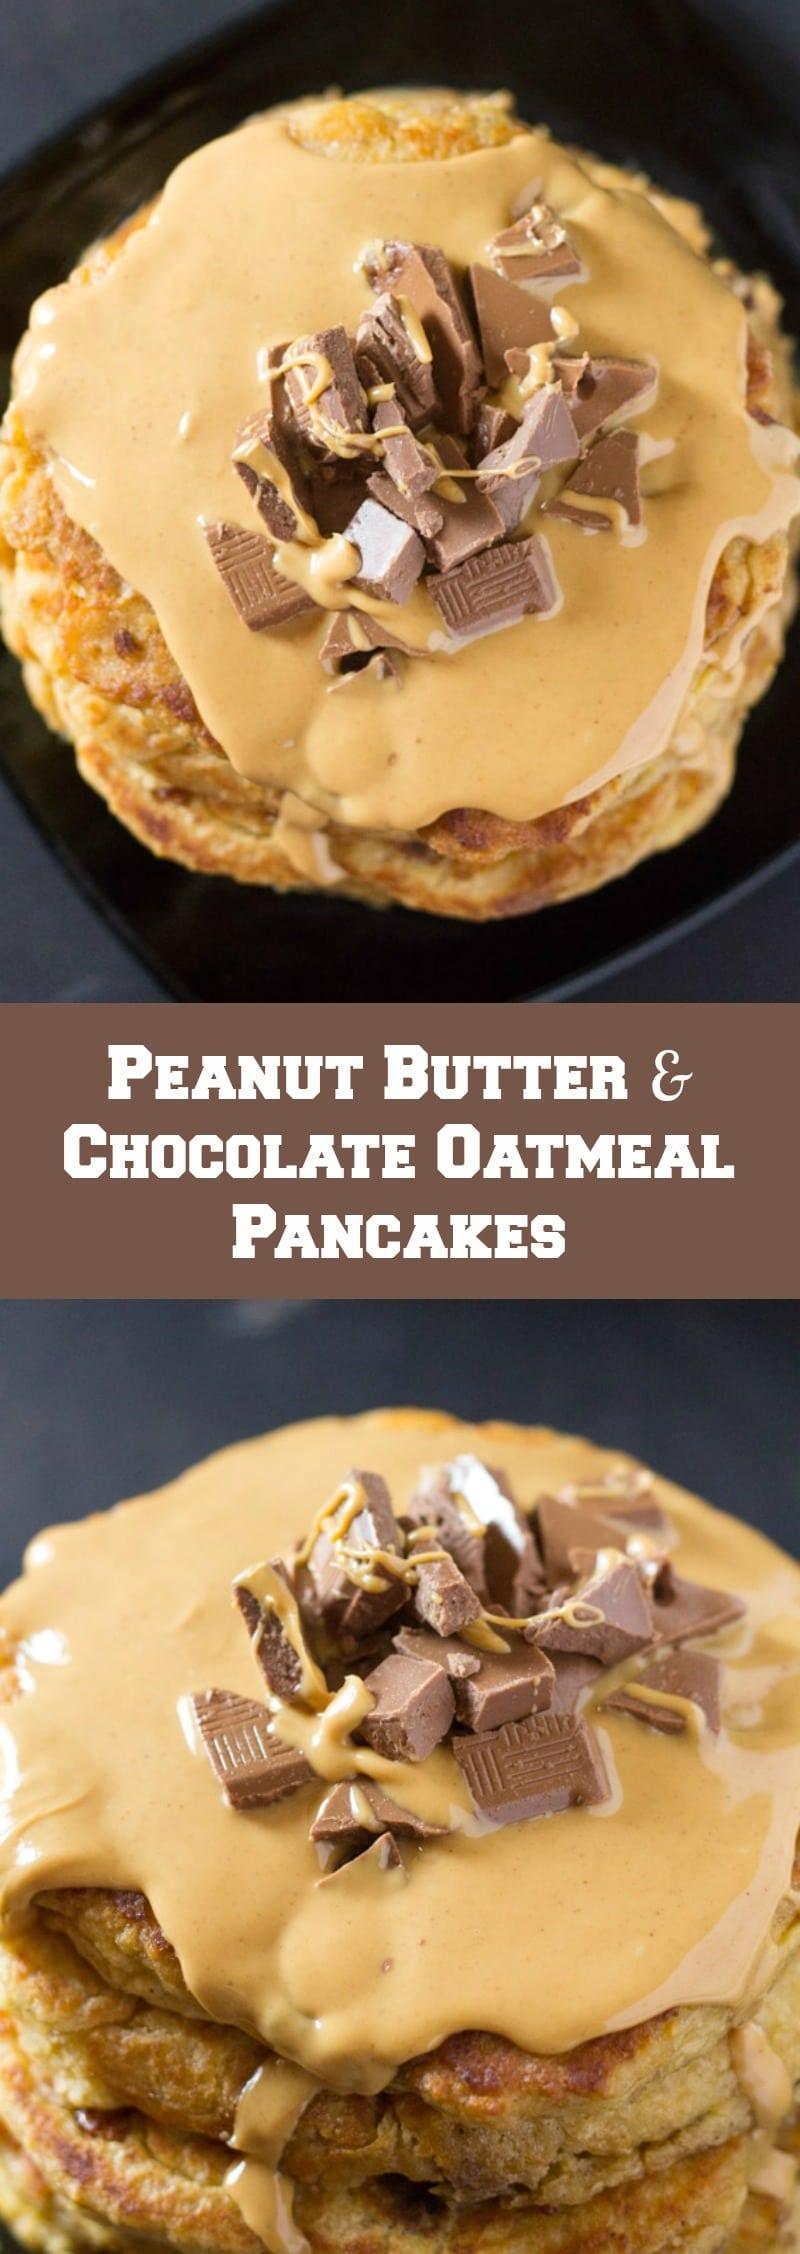 Peanut Butter & Chocolate Chunk Oatmeal Pancakes